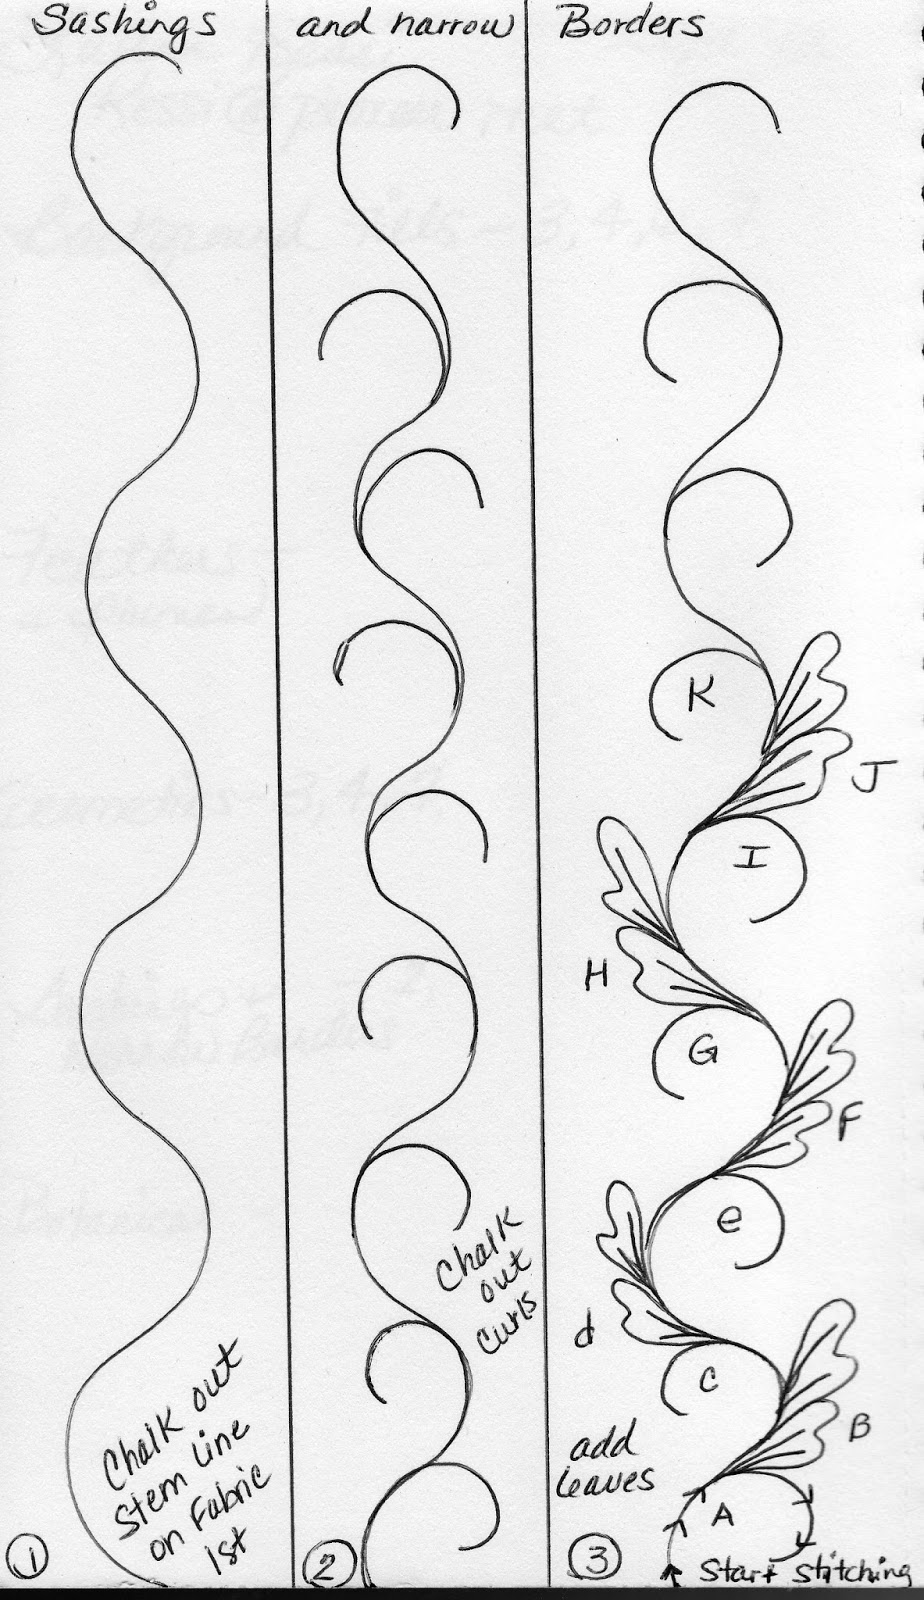 LuAnn Kessi Quilting SketchBookSashings And Narrow